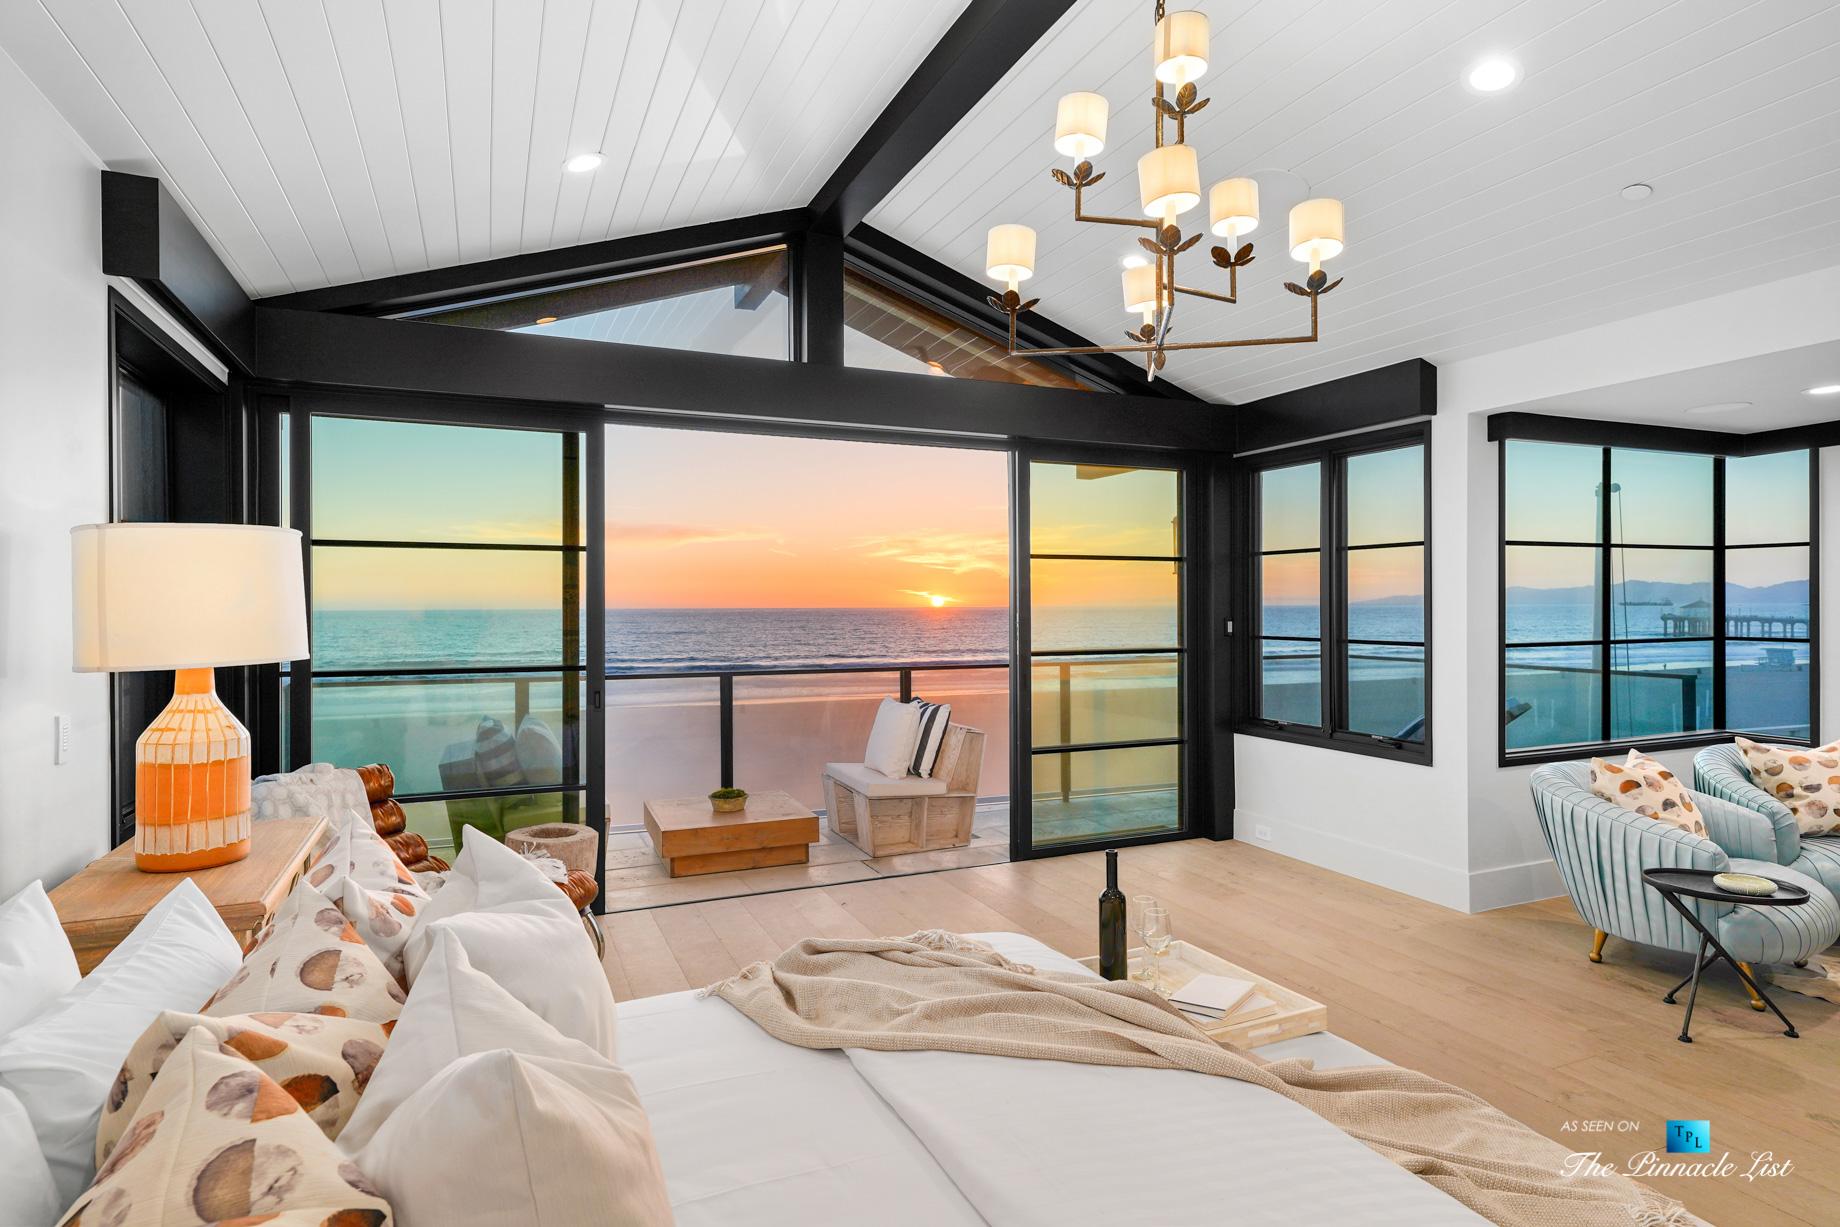 508 The Strand, Manhattan Beach, CA, USA – Twilight Master Bedroom Room – Luxury Real Estate – Oceanfront Home